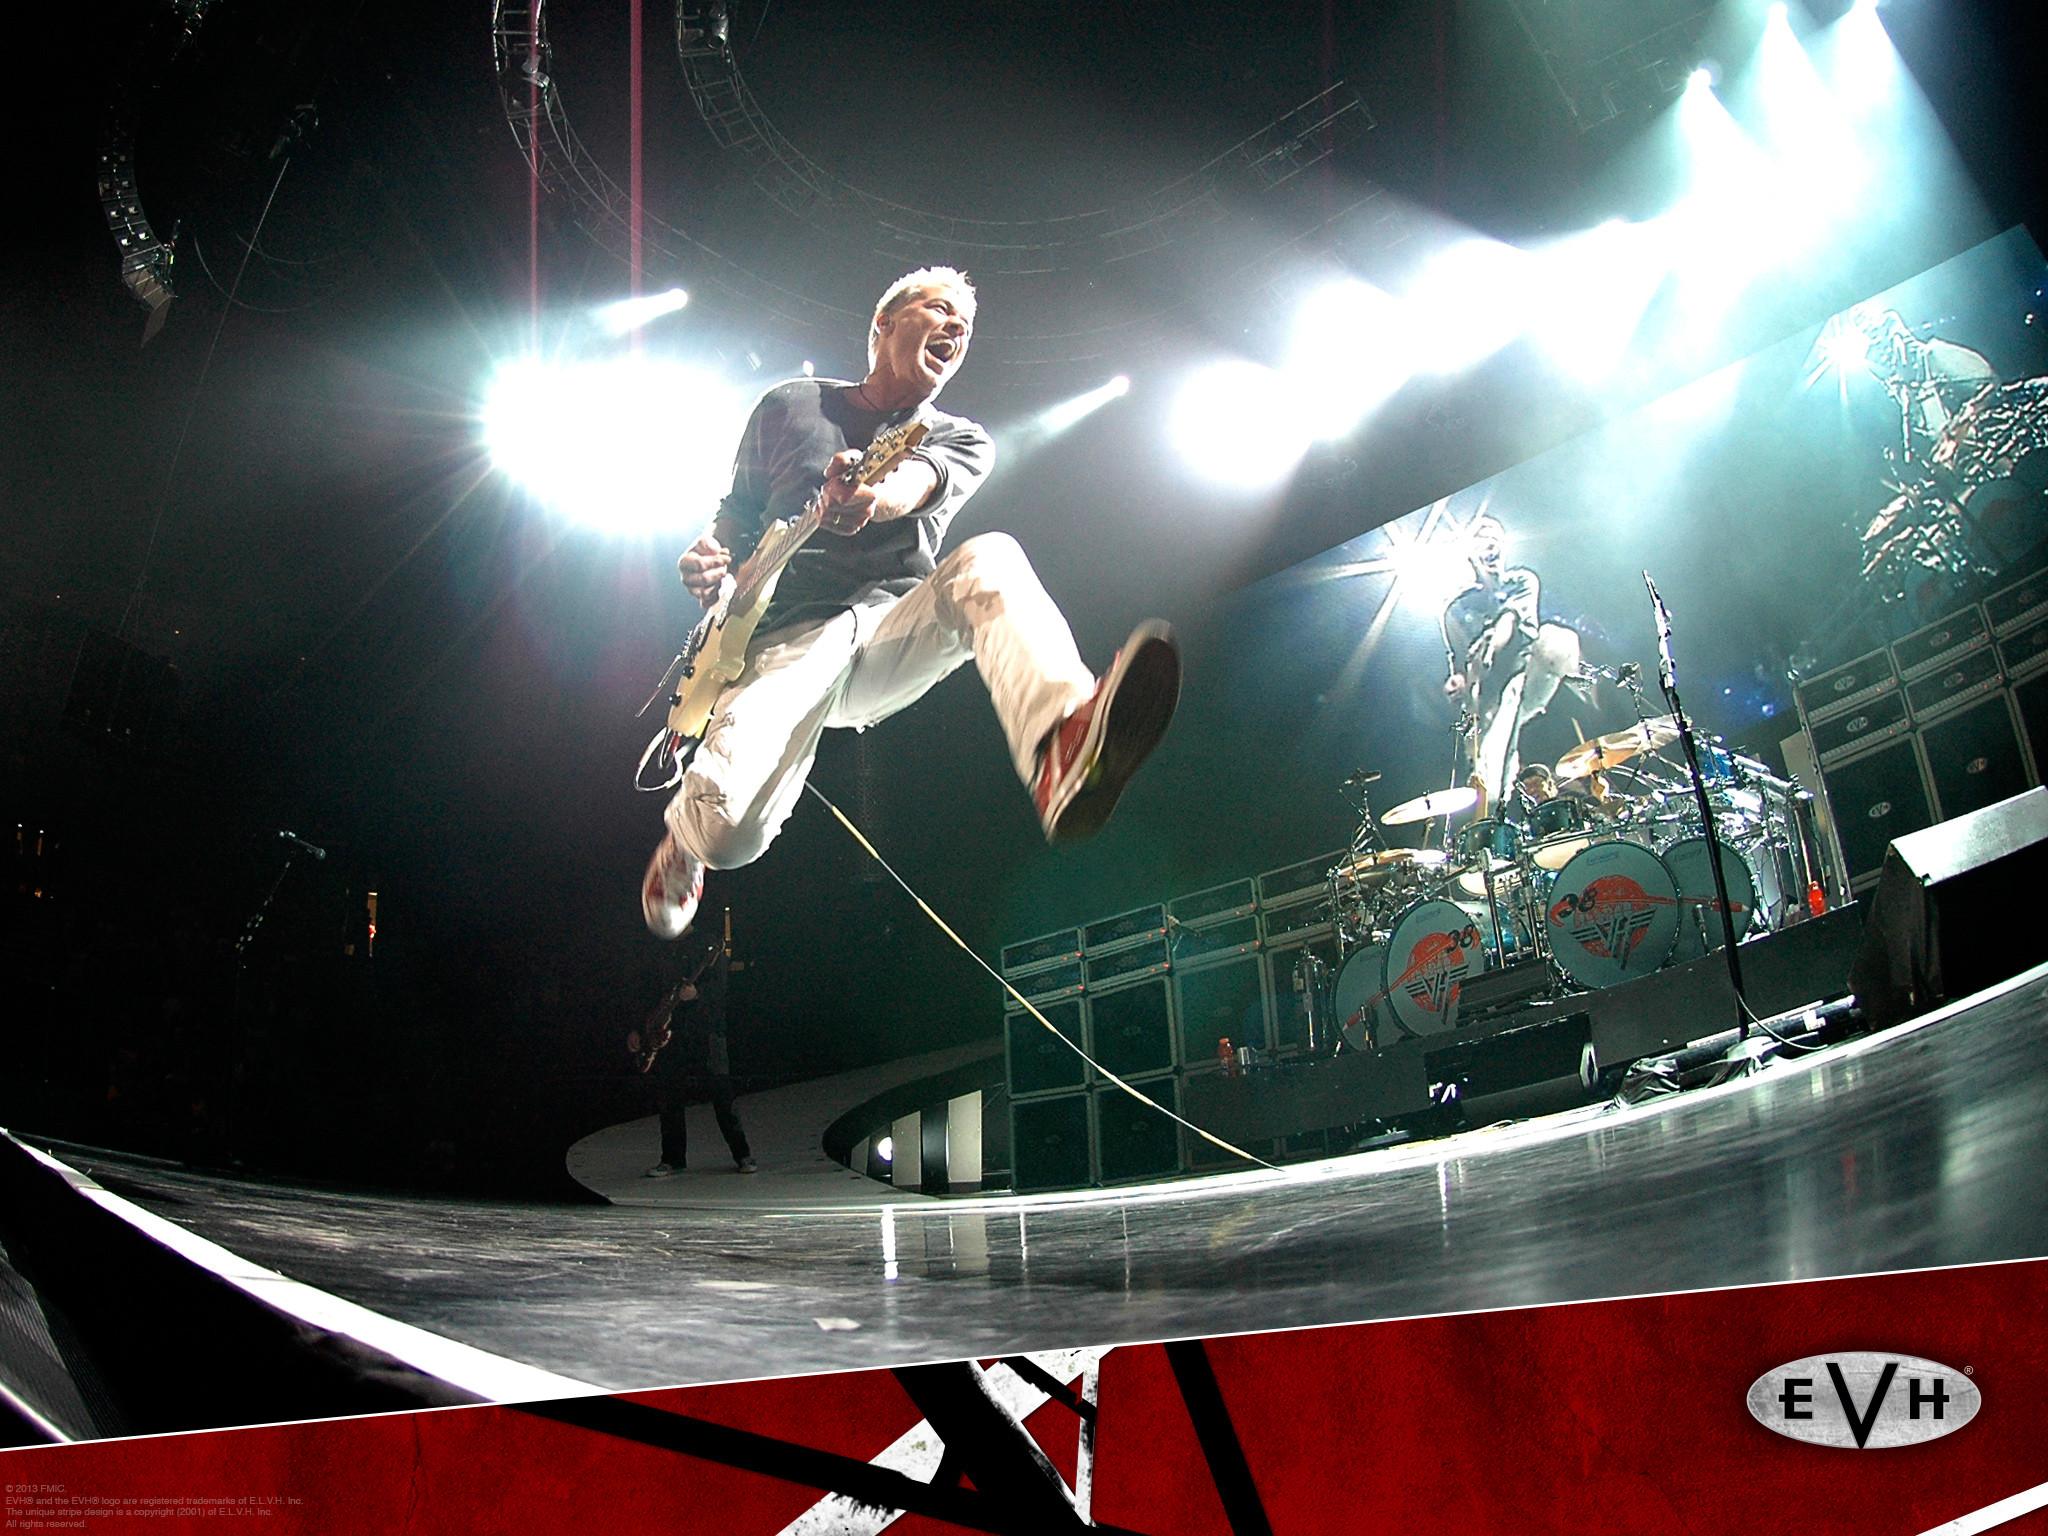 Eddie Van Halen Wallpaper ·① WallpaperTag